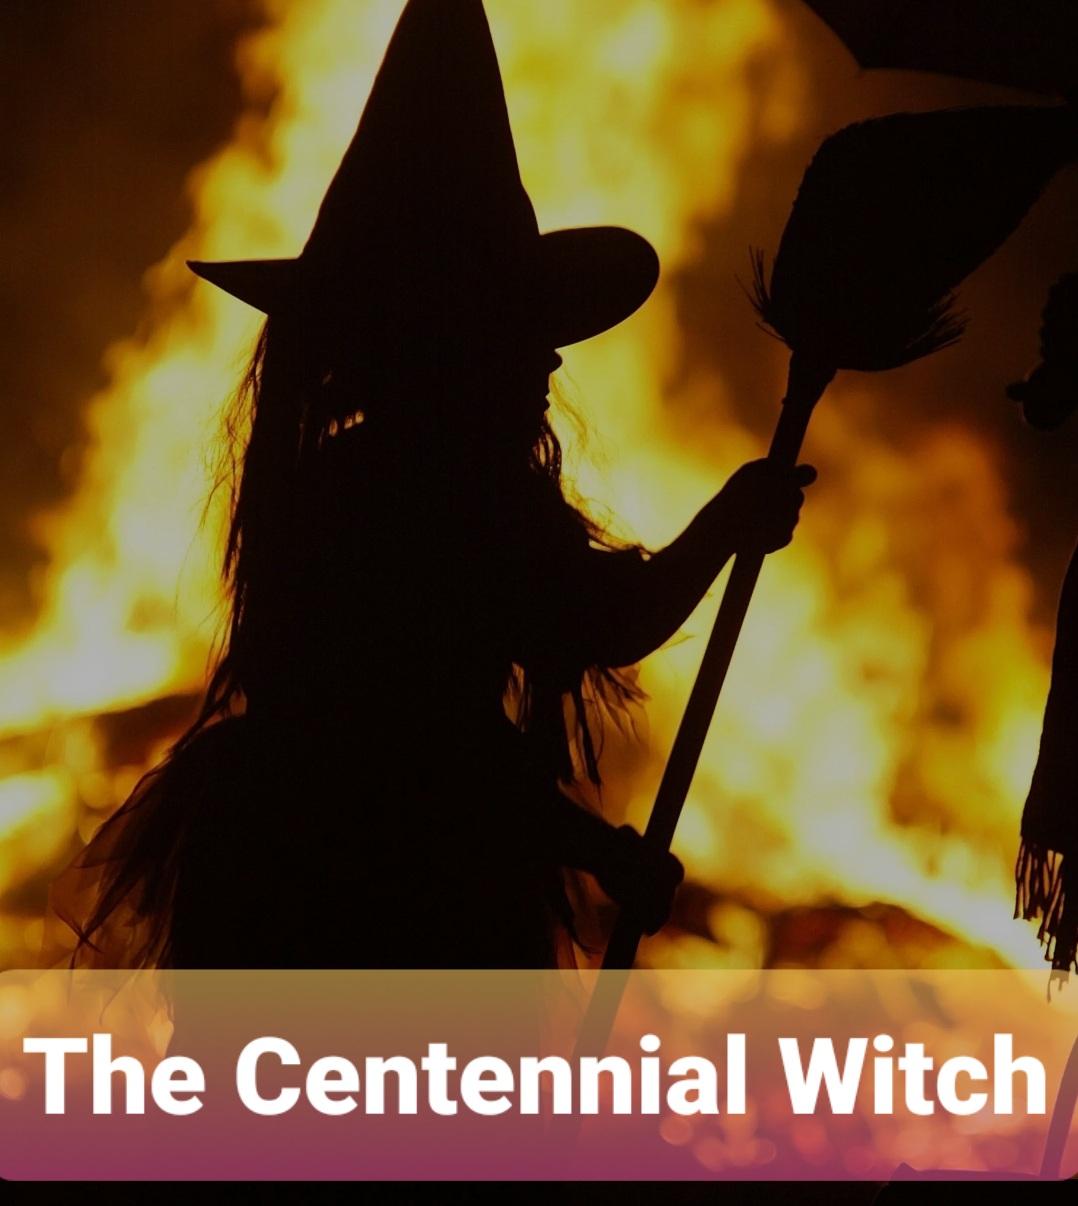 The Centennial Witch